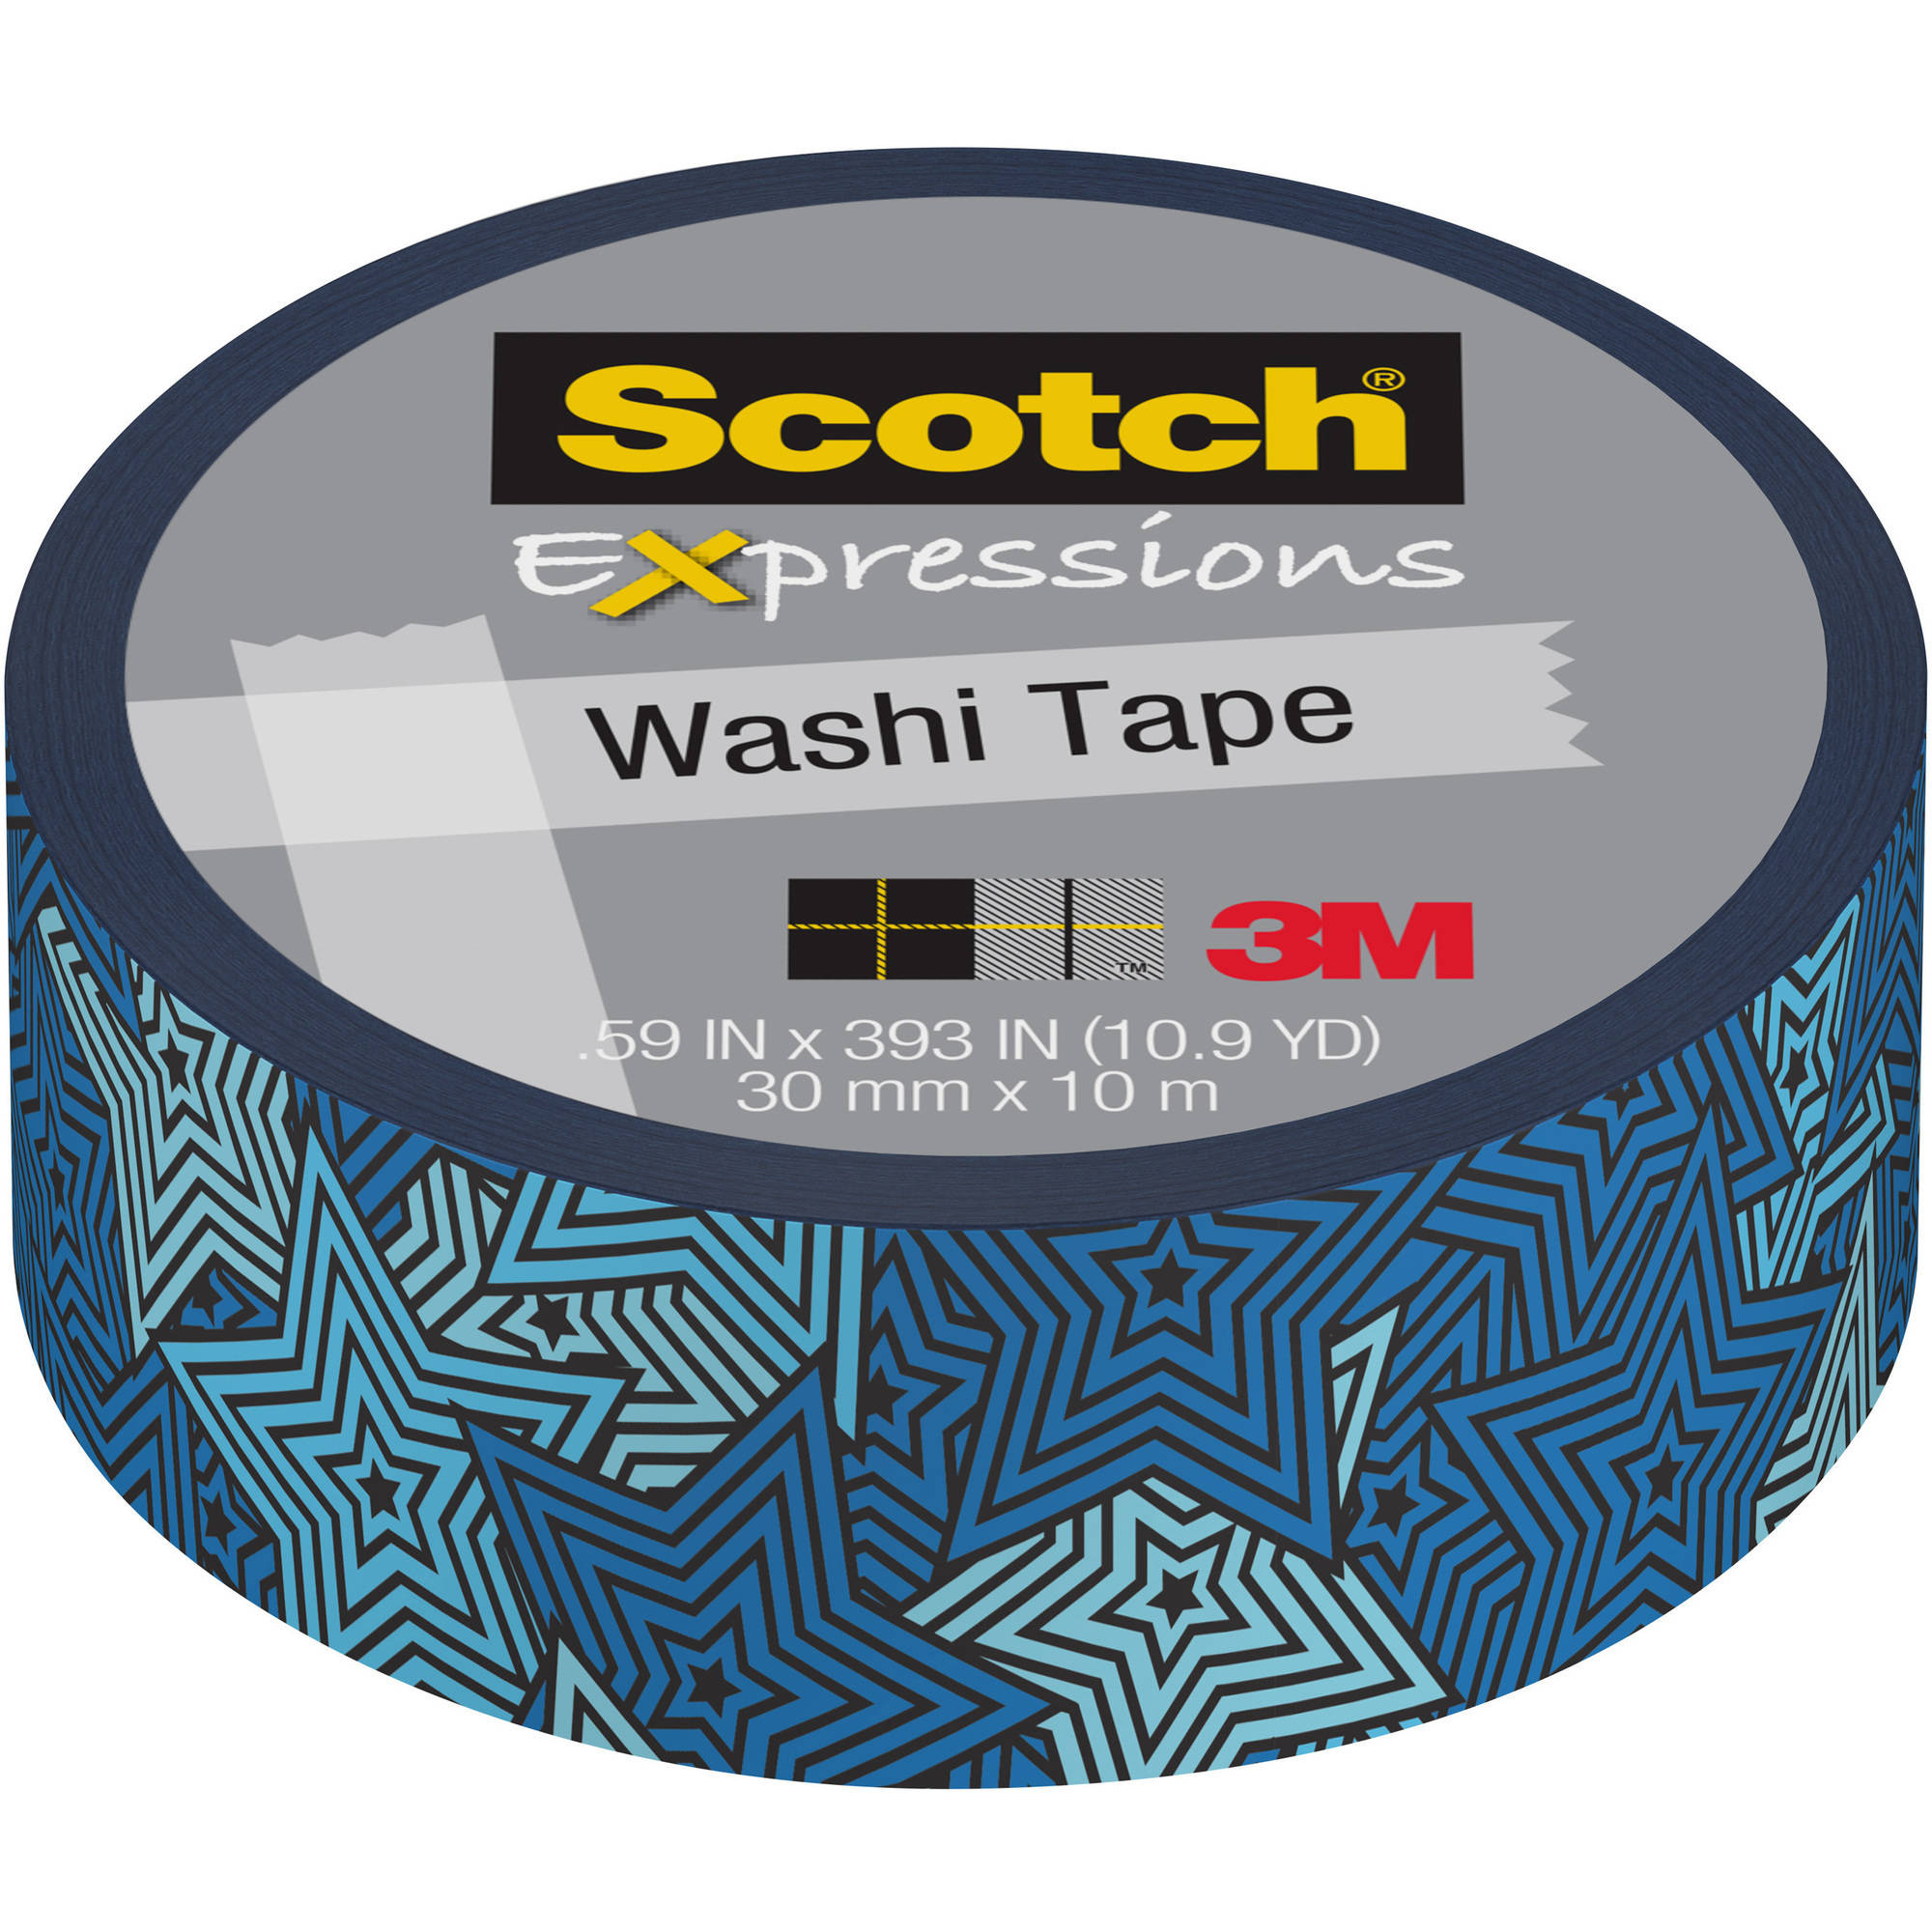 "Scotch Expressions Washi Tape, .59"" x 393"", Retro Blue Stars"